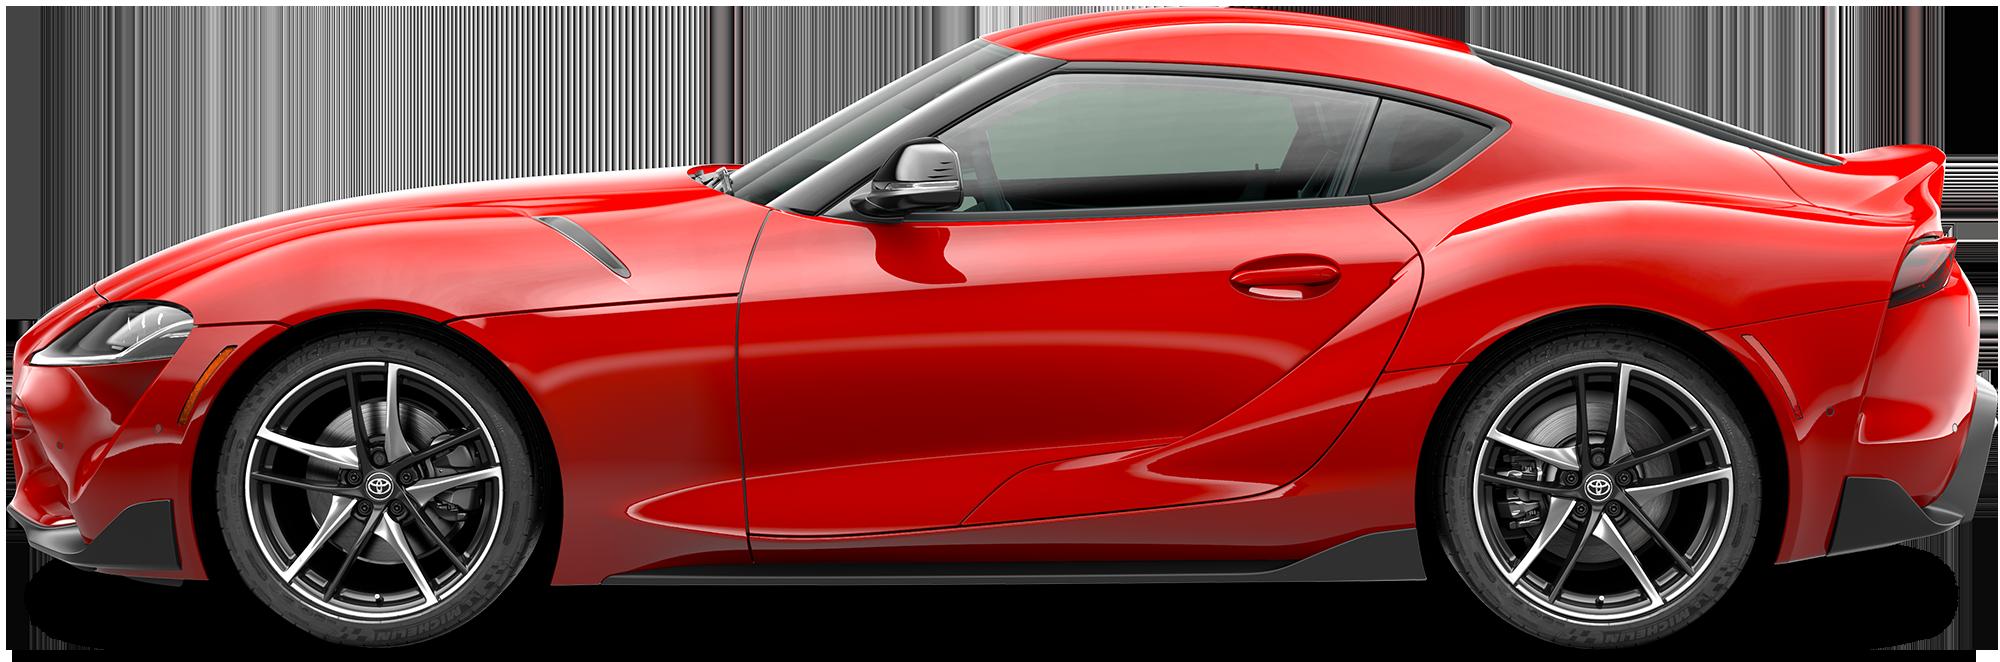 2020 Toyota Supra Coupe 3.0